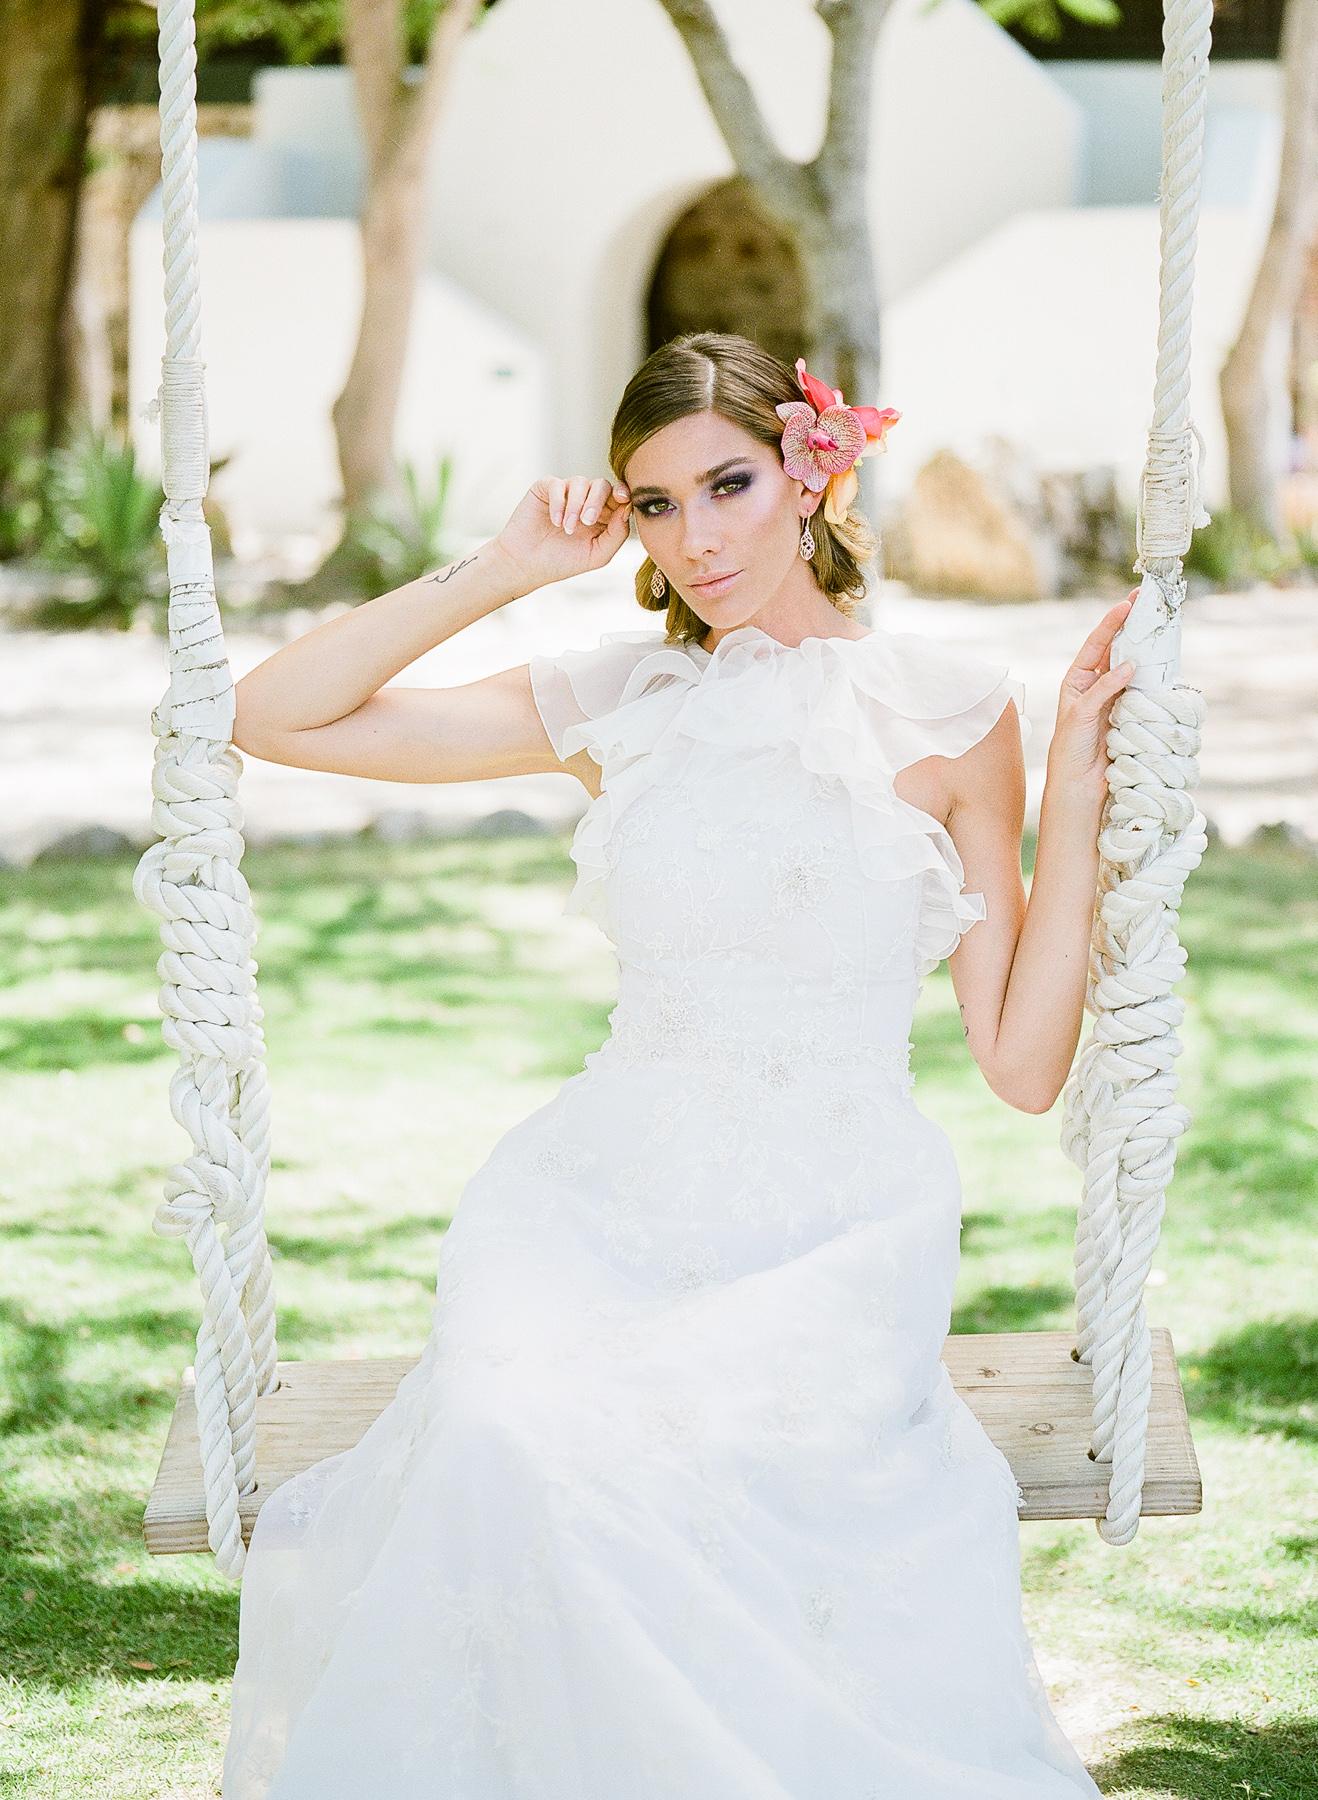 Grand-Cayman-Wedding-015.jpg